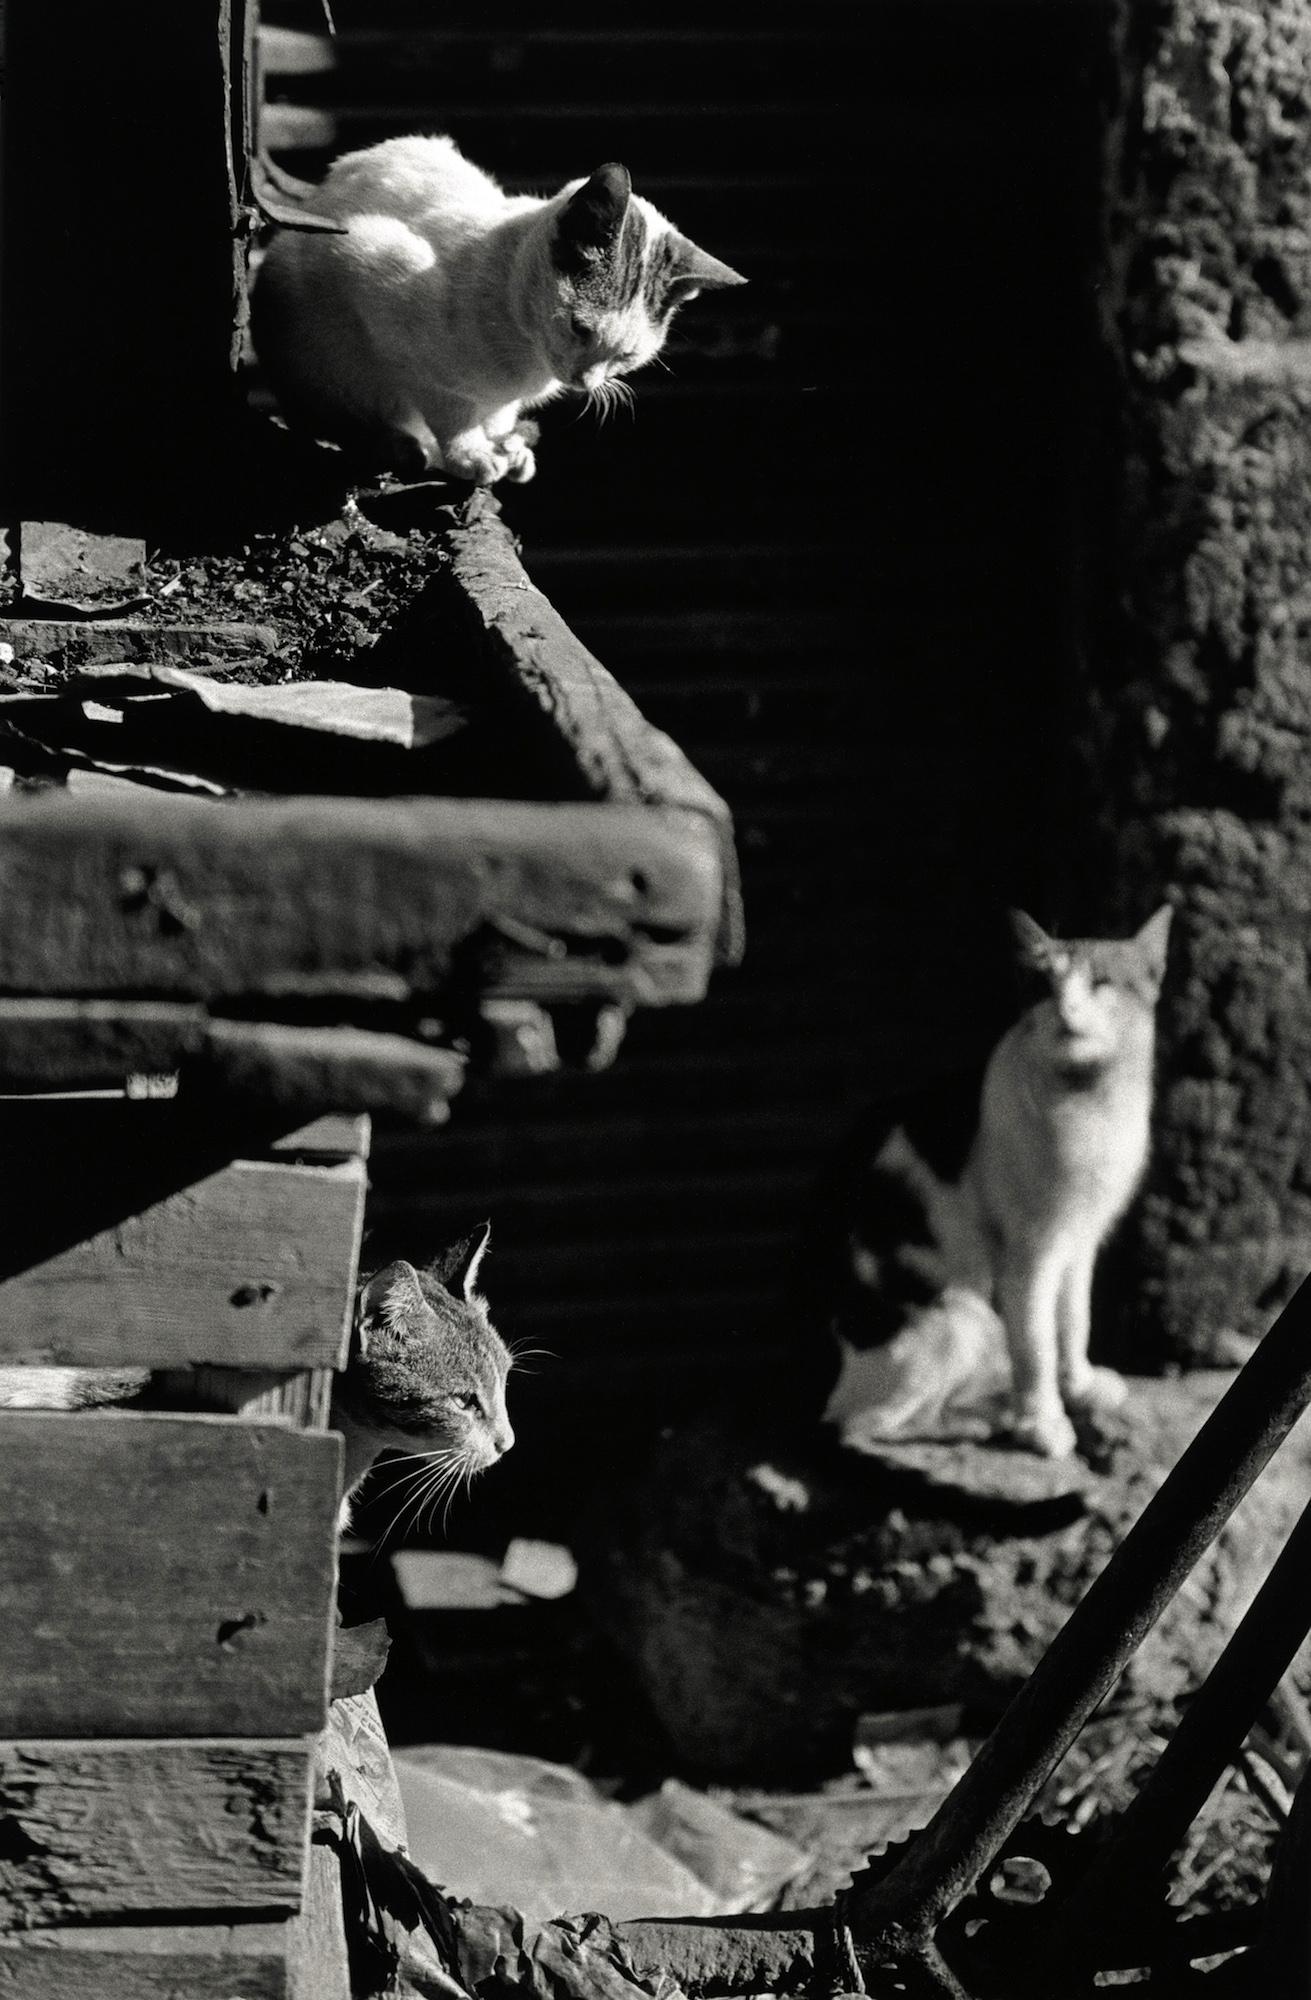 walter_rothwell_photography_cats-09.jpg